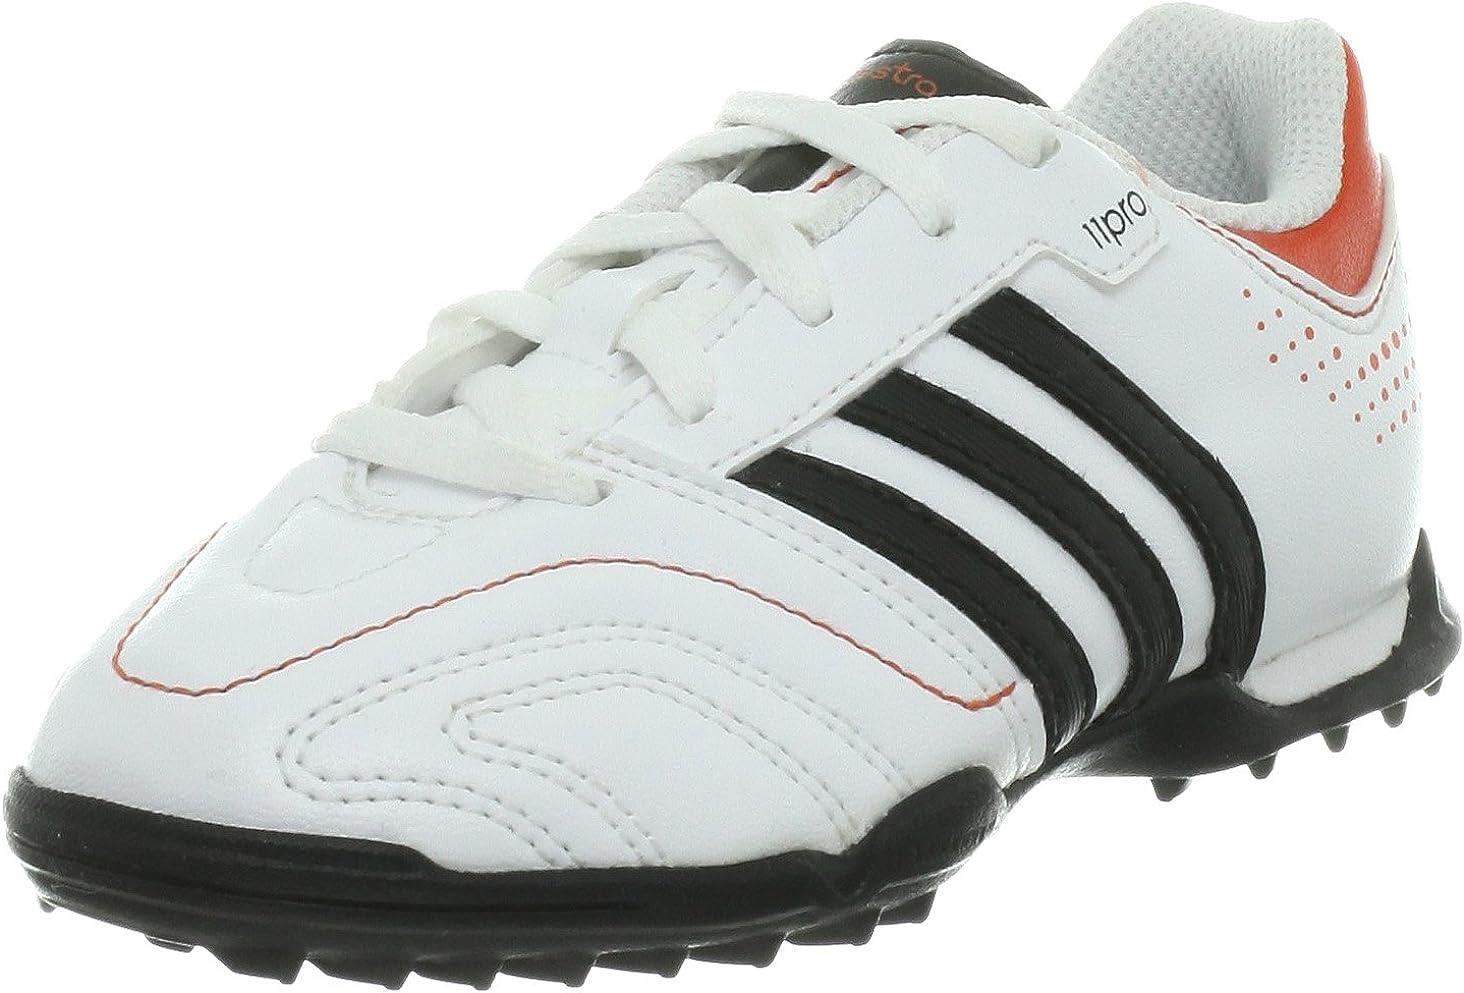 Adidas - 11 Questra TRX TF J - V23712 - El Color: Blanco ...